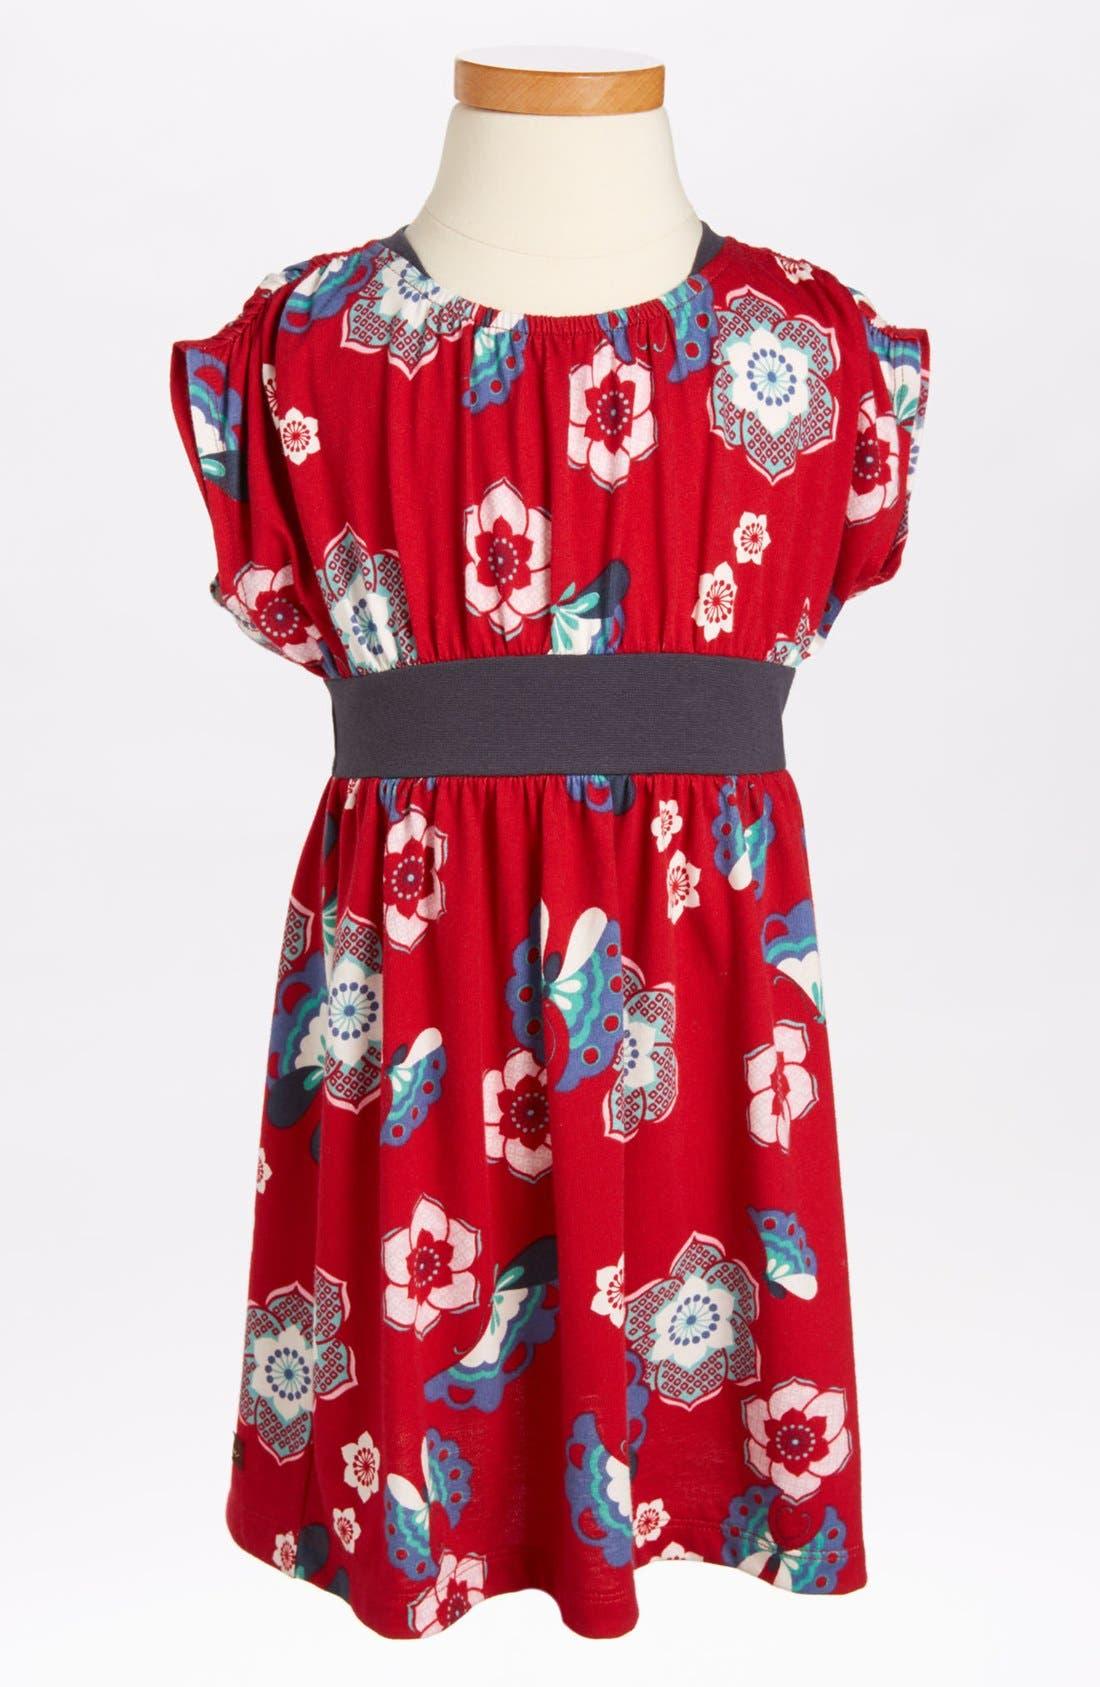 Alternate Image 1 Selected - Tea Collection Print Banded Dress (Little Girls & Big Girls)